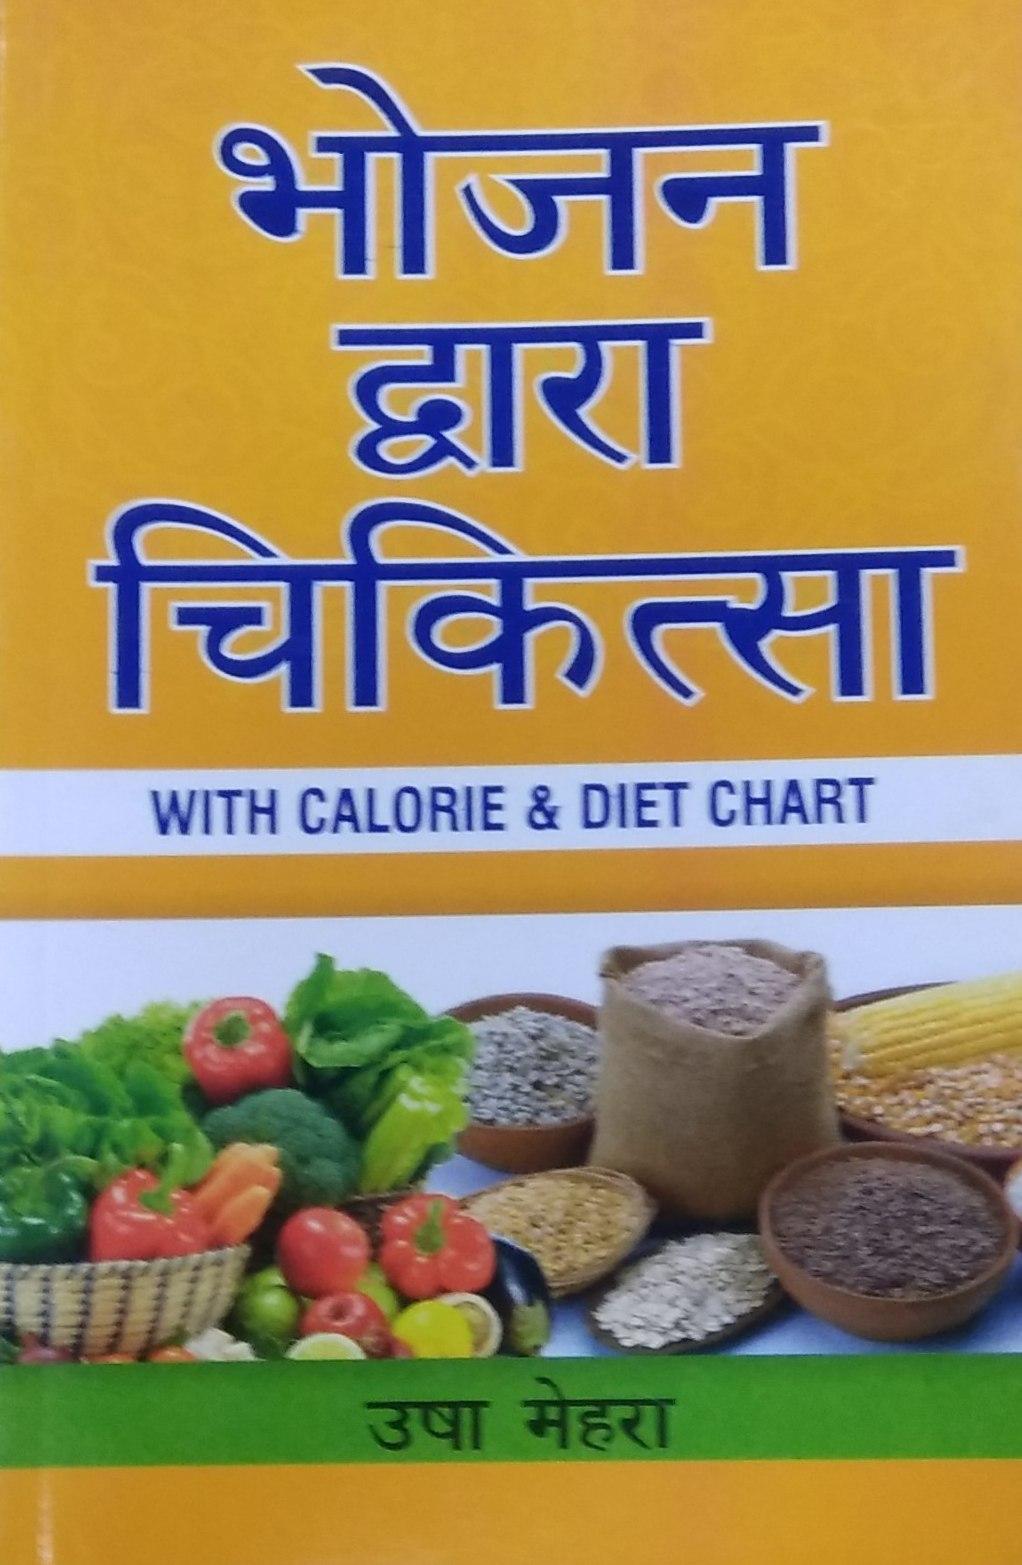 Bhojan Dwara Chikitsa (With Calorie & Diet Chart) …